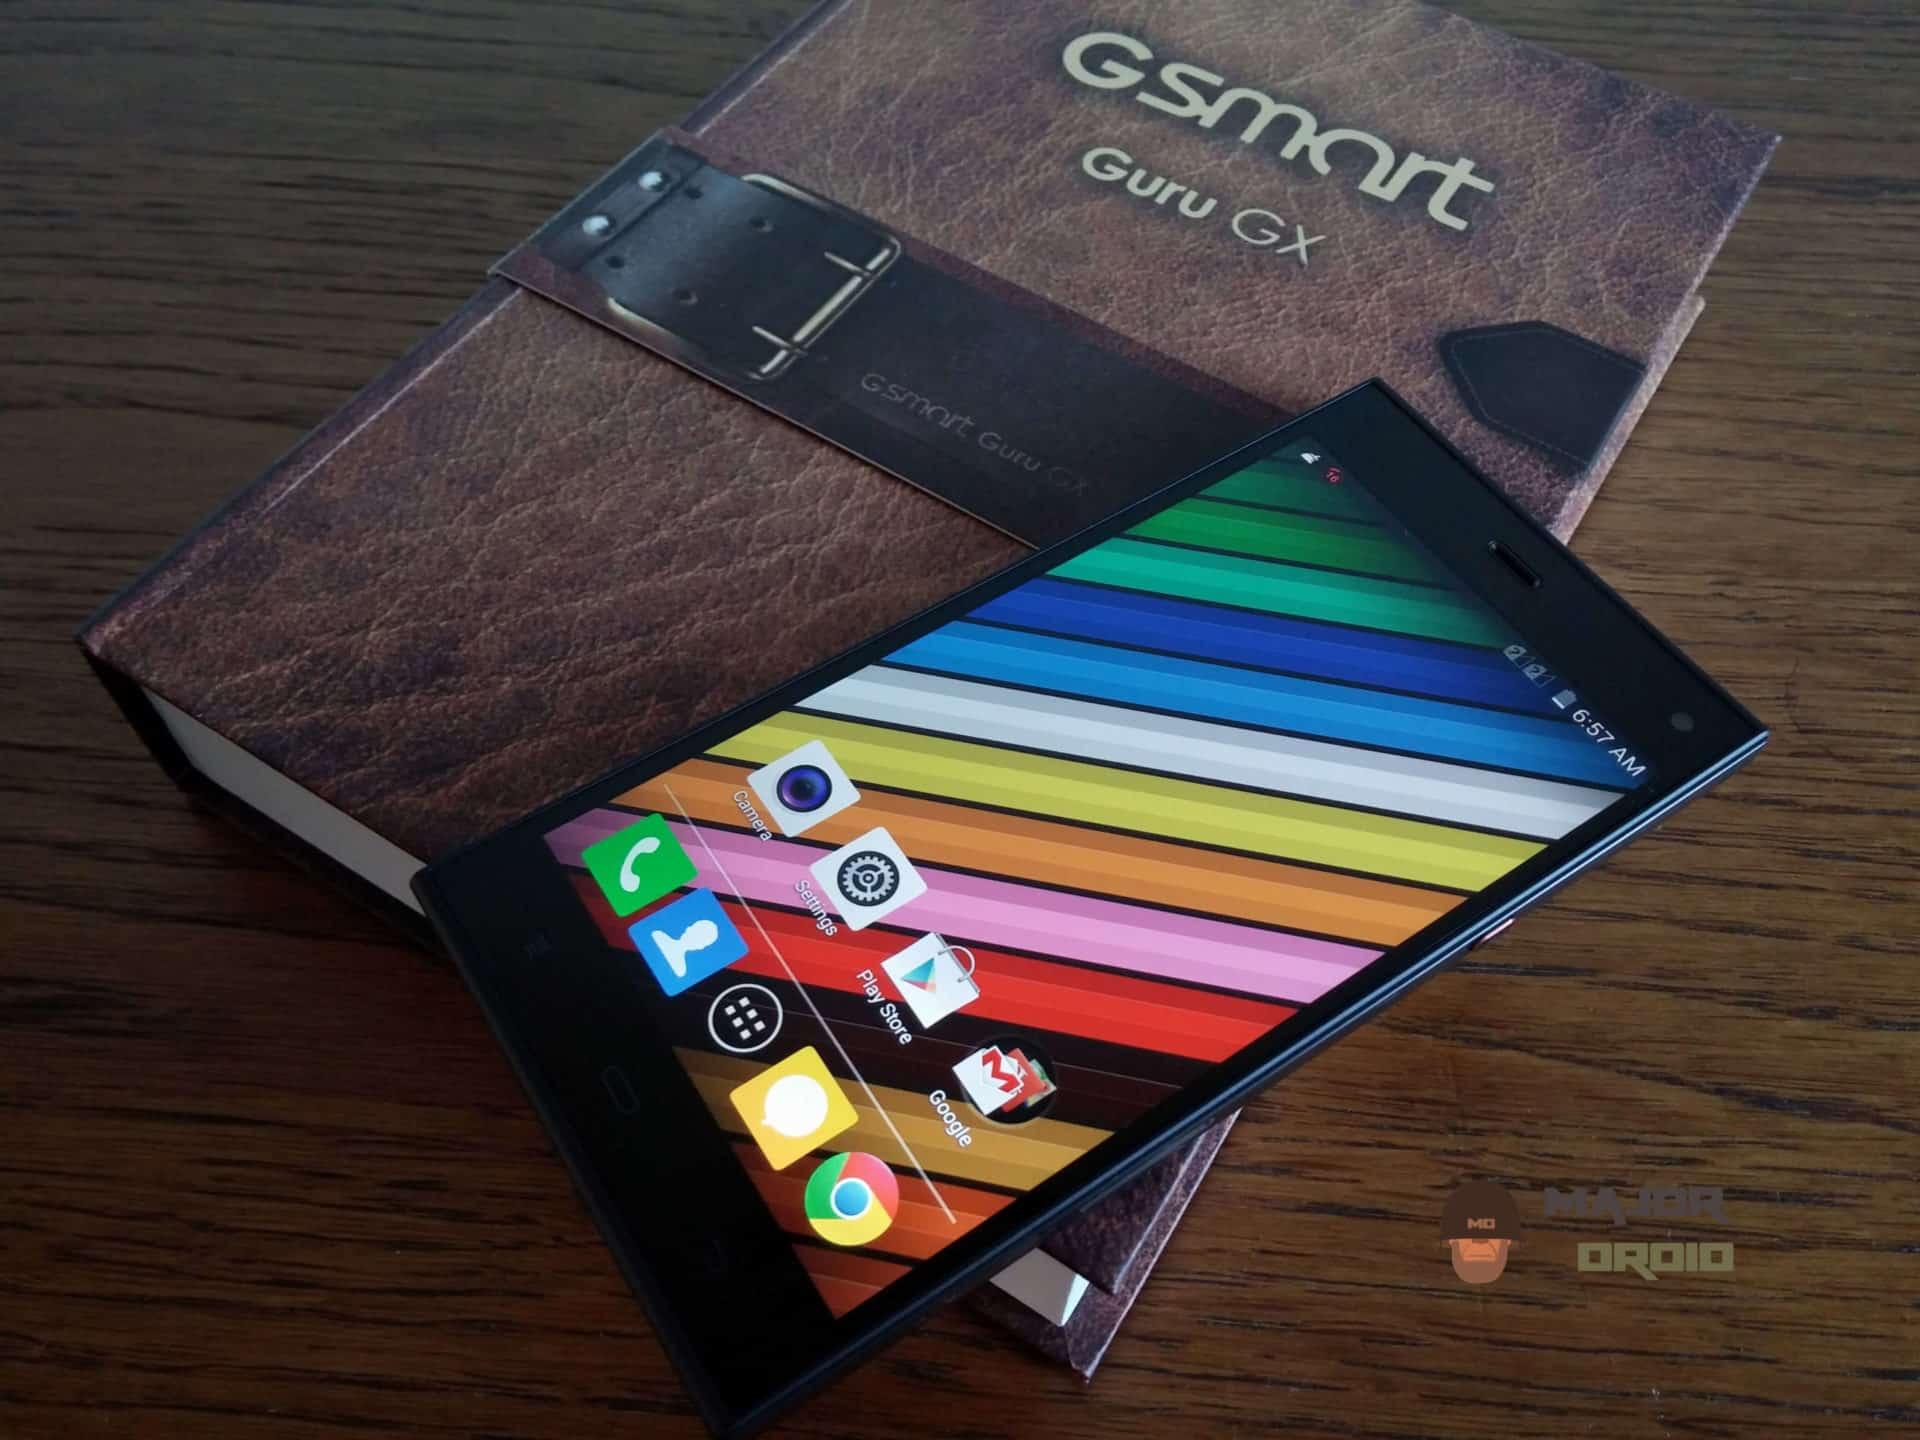 dual-sim smartphone gsmart guru gx